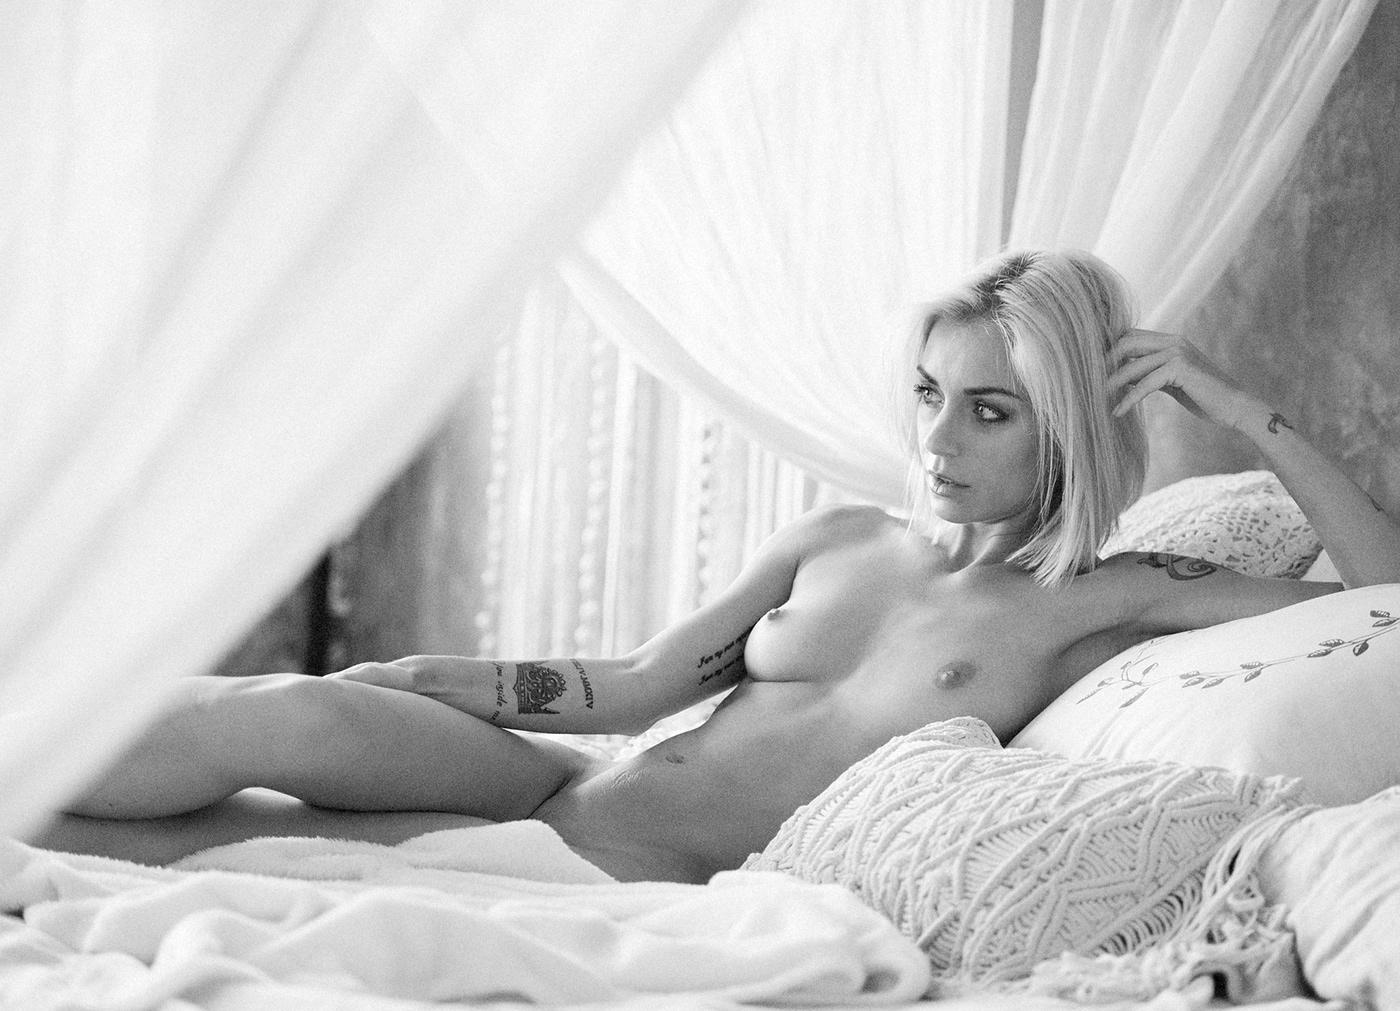 Sveta / фотограф Martin Wieland